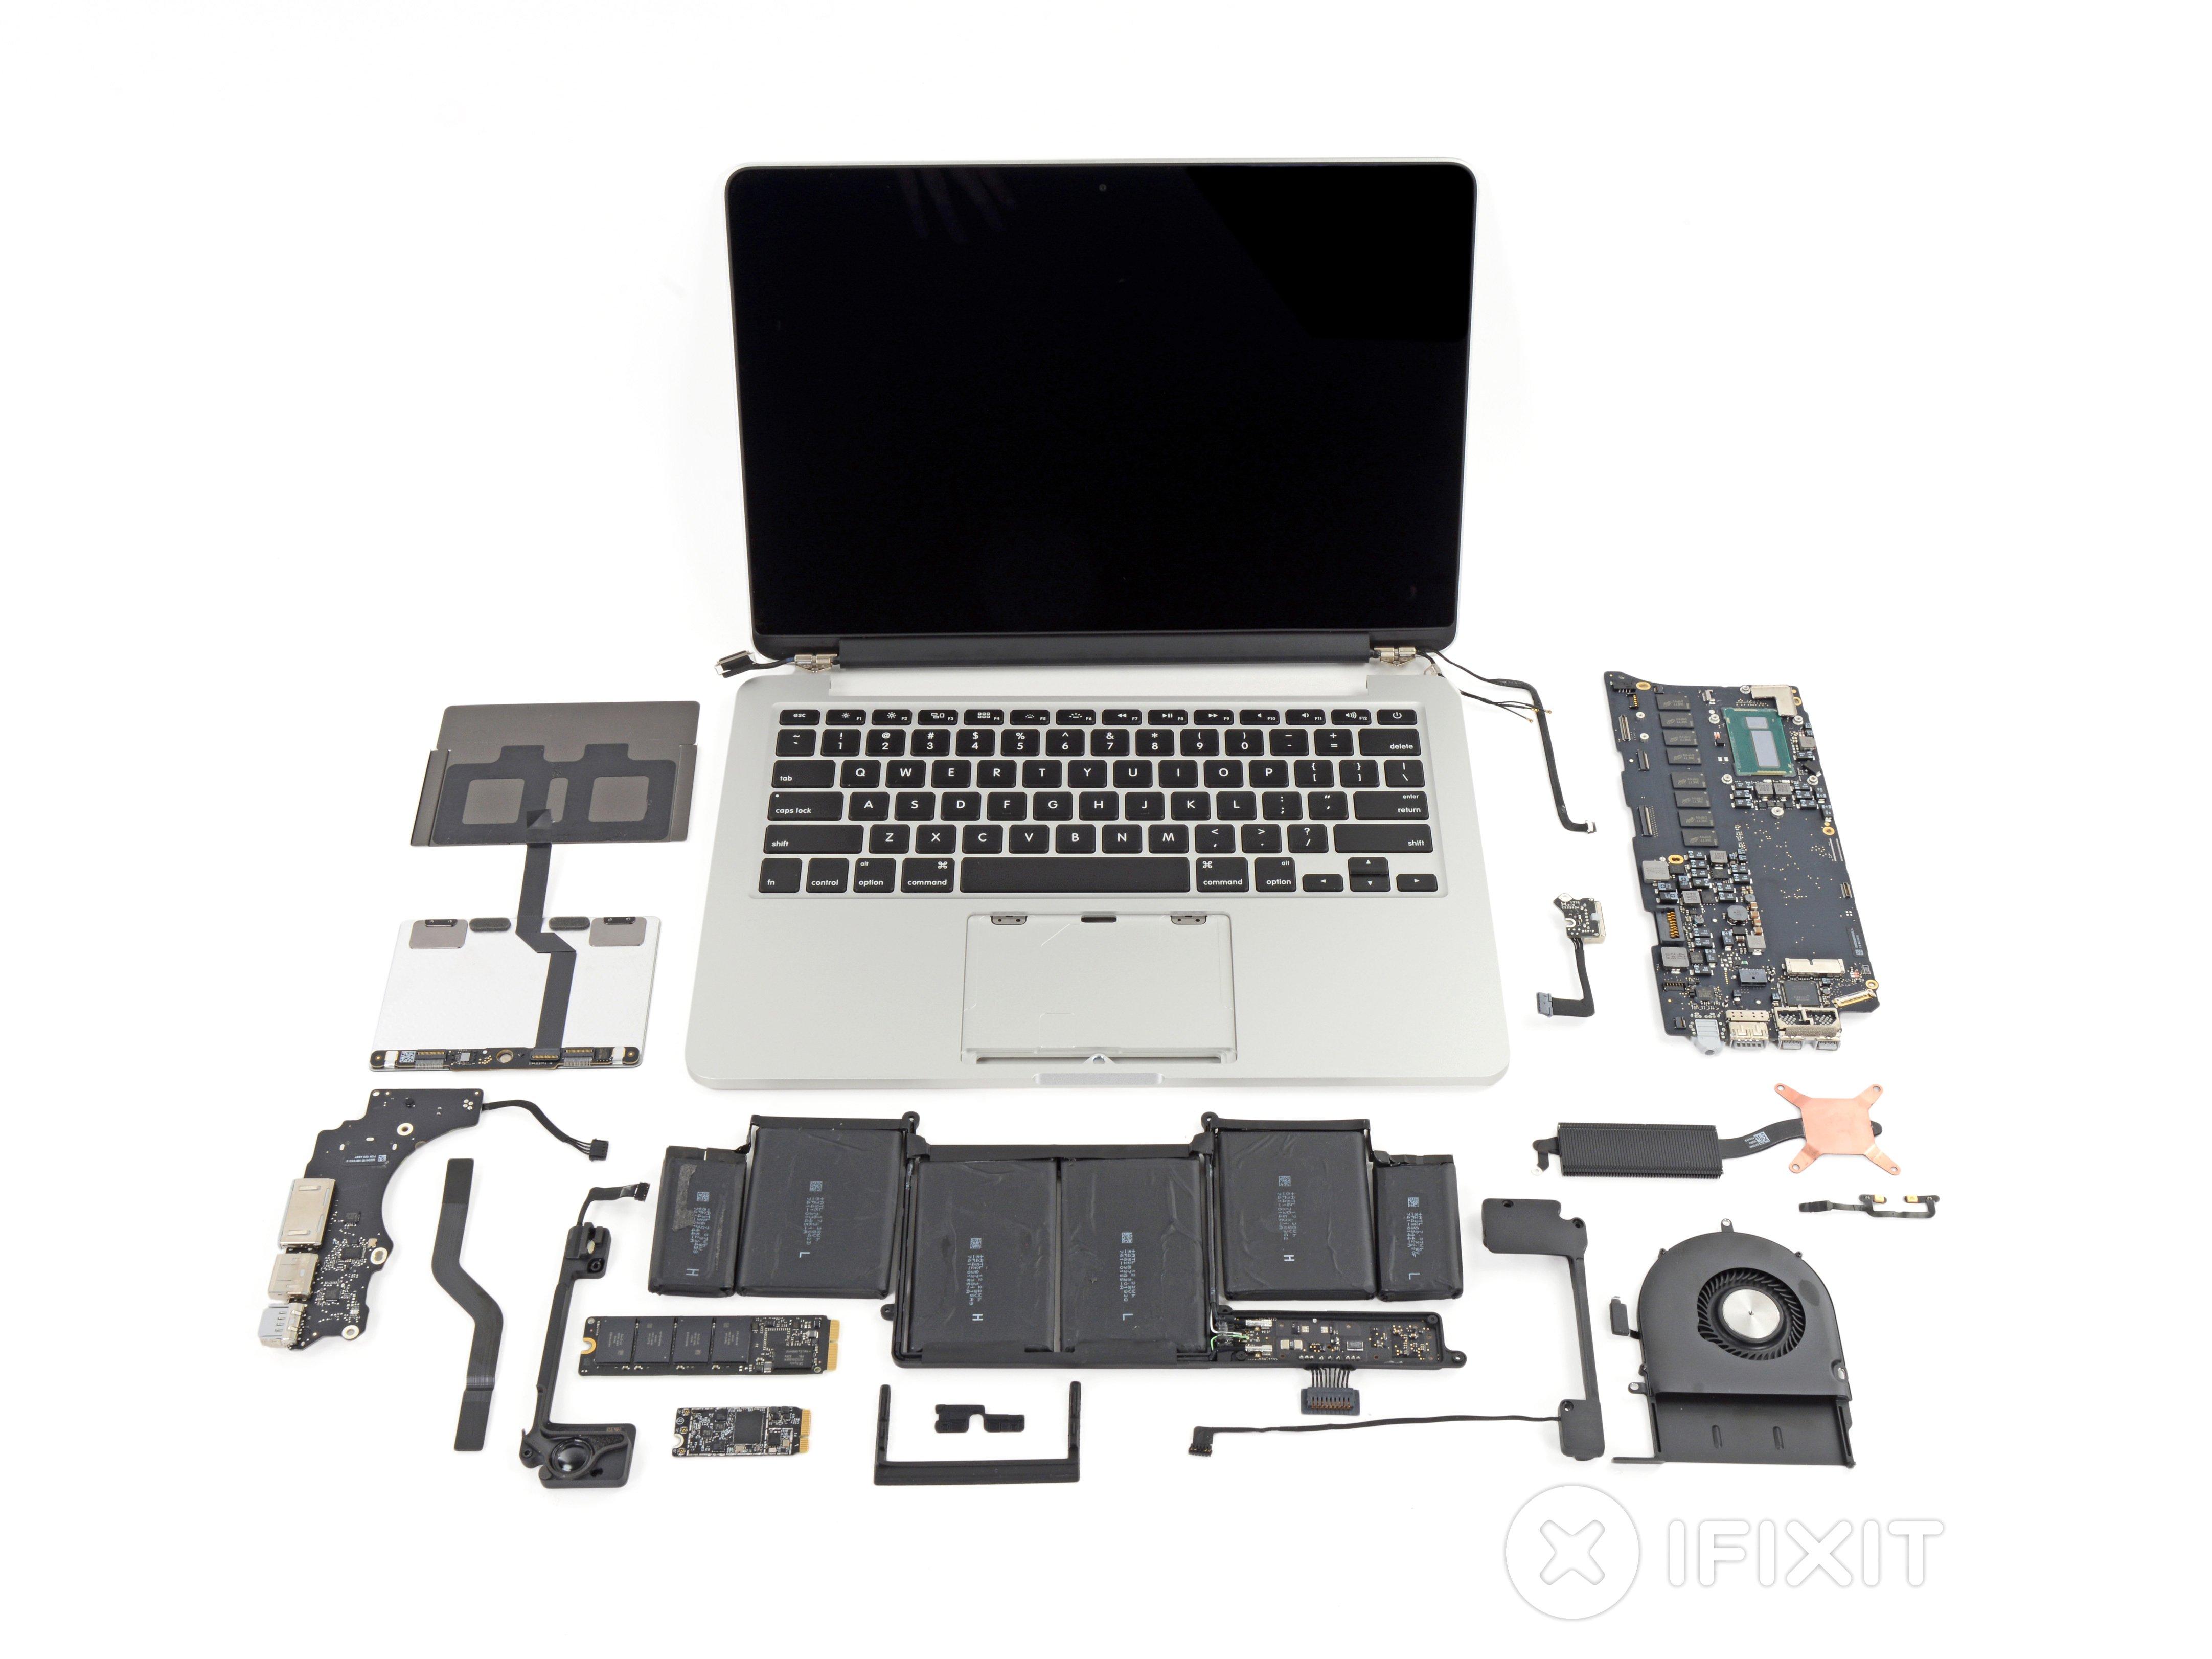 Macbook Pro 13 U0026quot  Retina Display Late 2013 Teardown